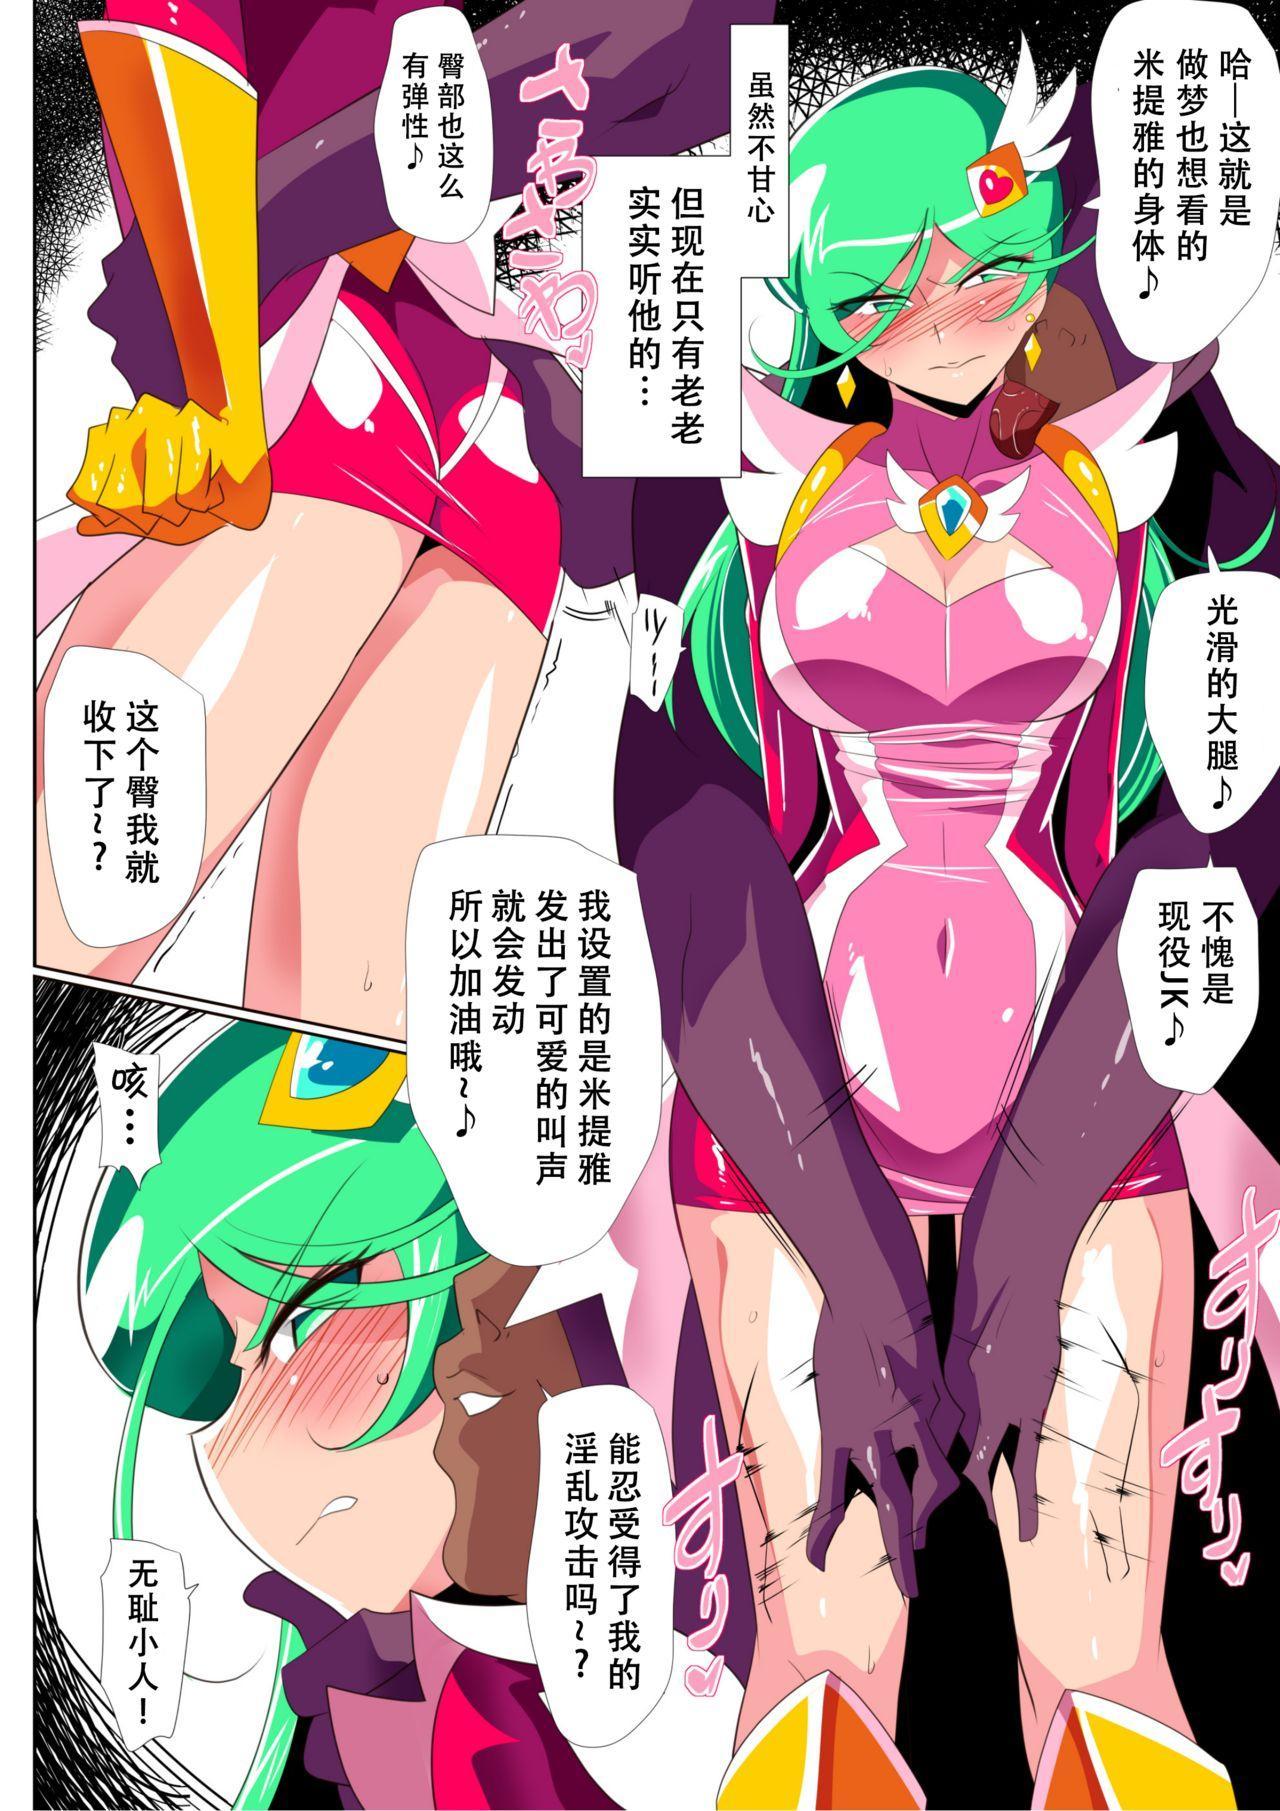 HEROINE LOSE 2 Psycho Lady Meteor Hen Psycho Power Heroine VS Kyousei Chikan Choukyou! 4